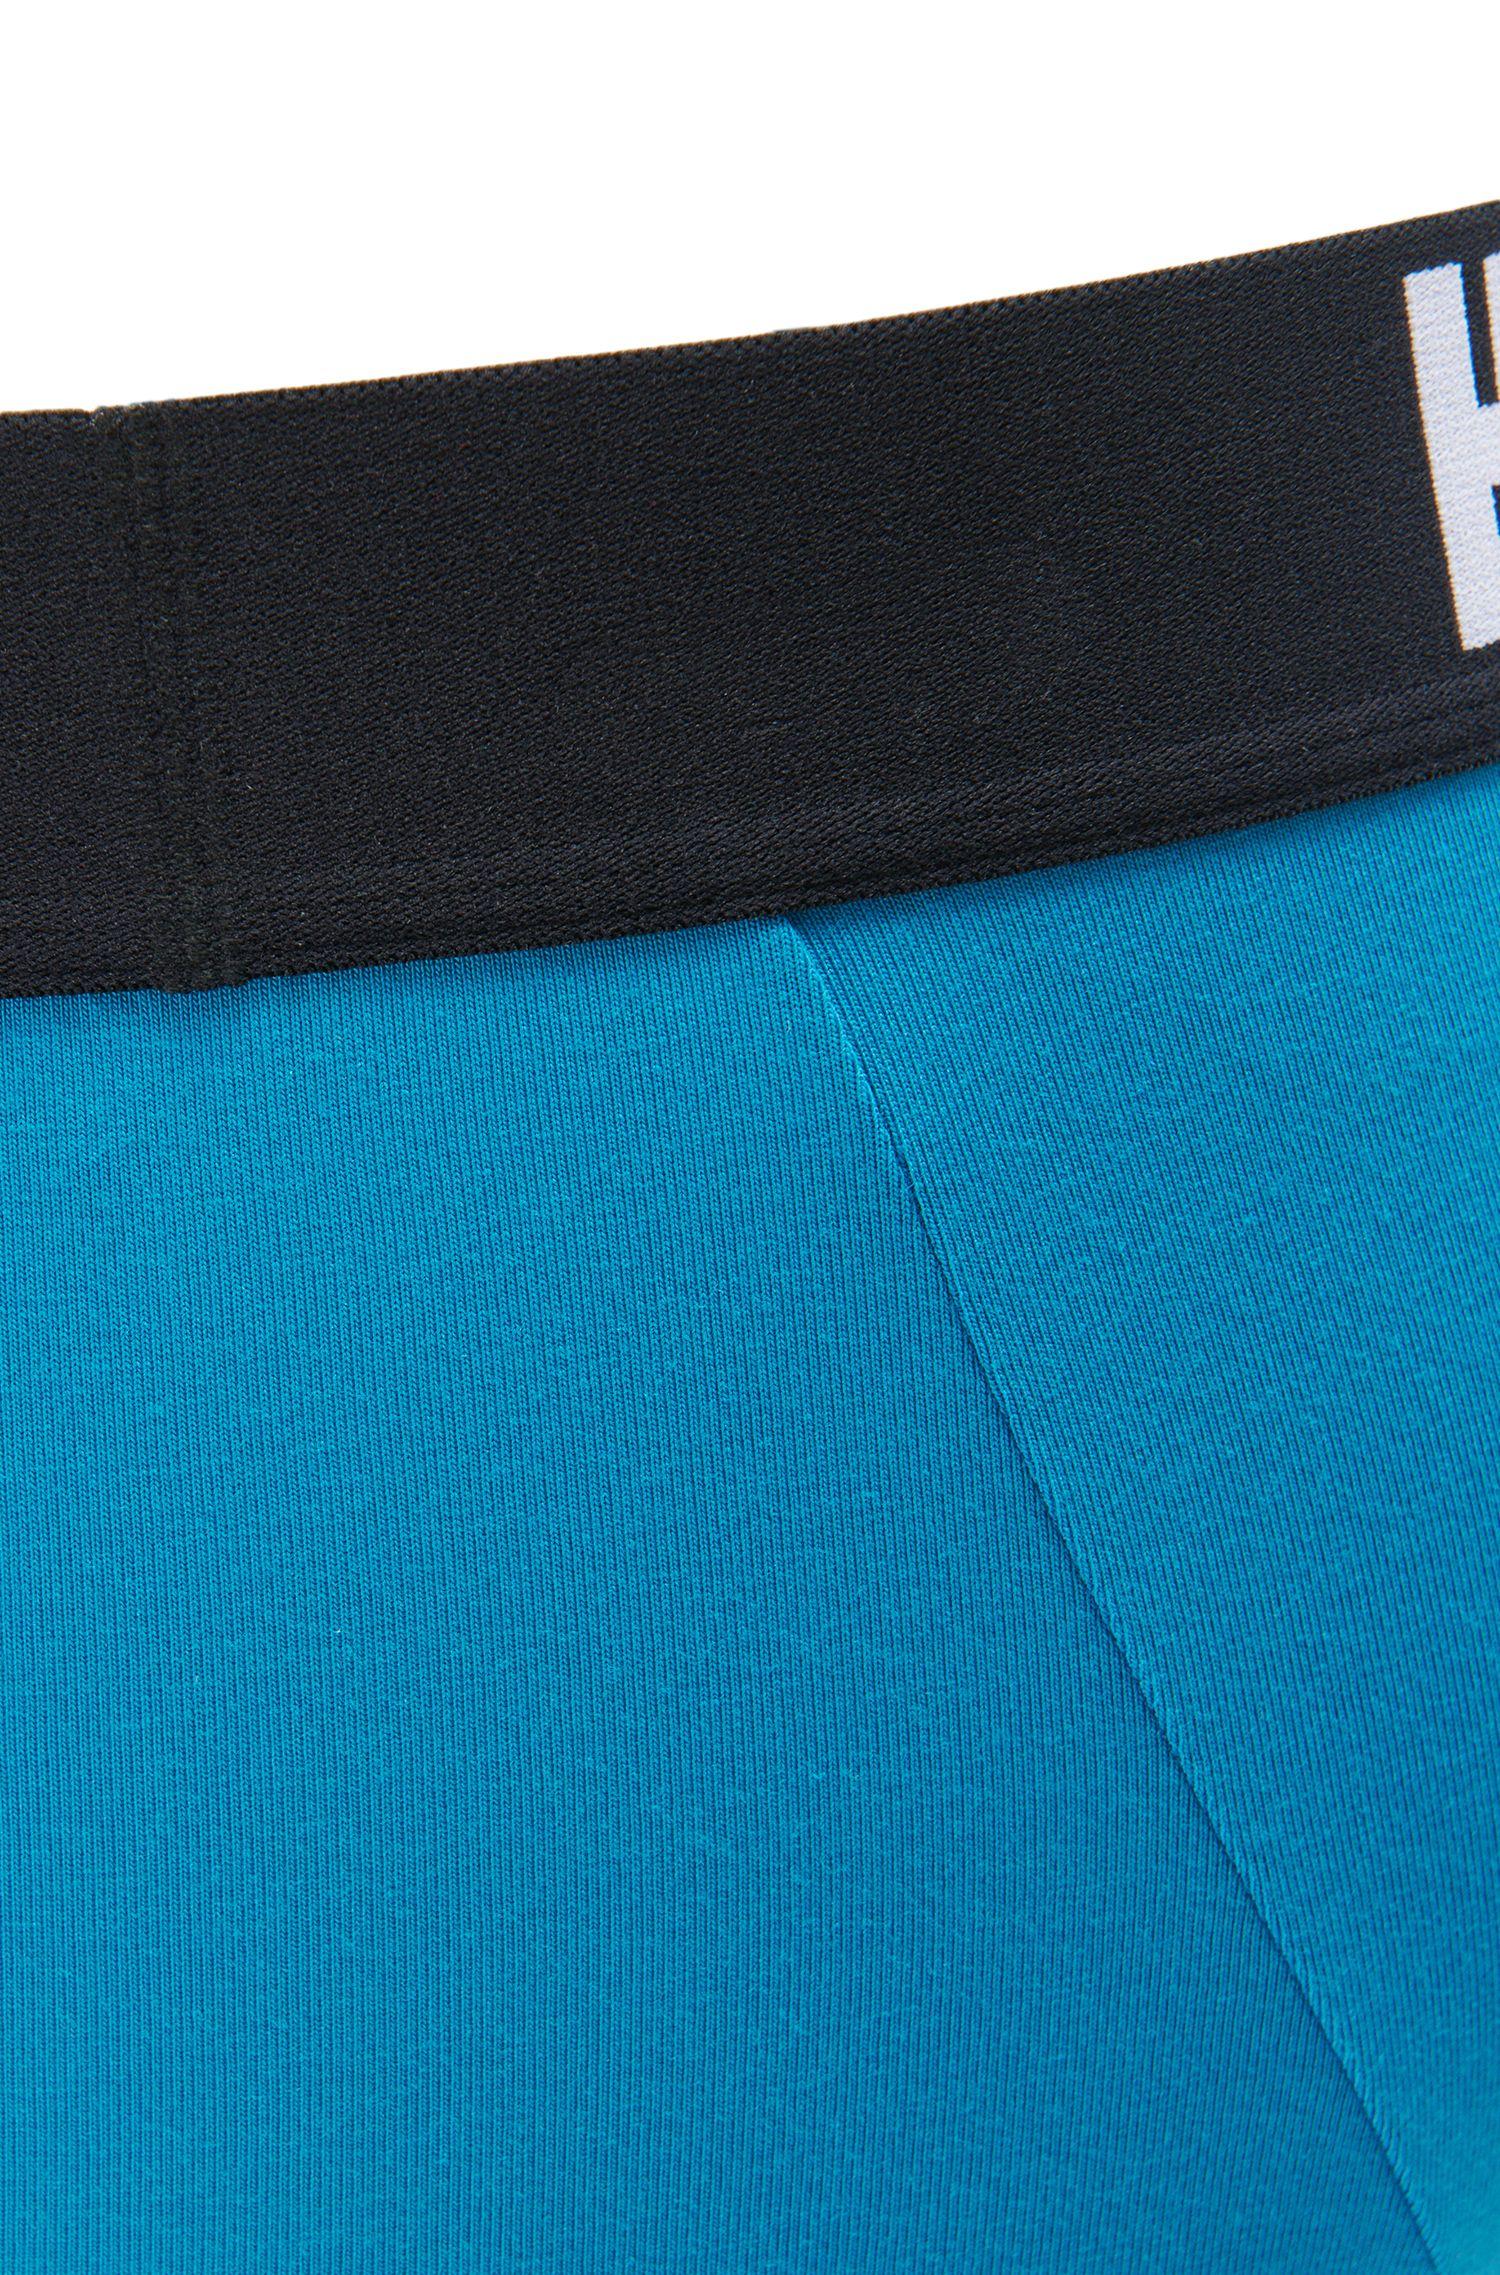 Stretch Cotton Modal Logo Trunk | Trunk Signature, Turquoise